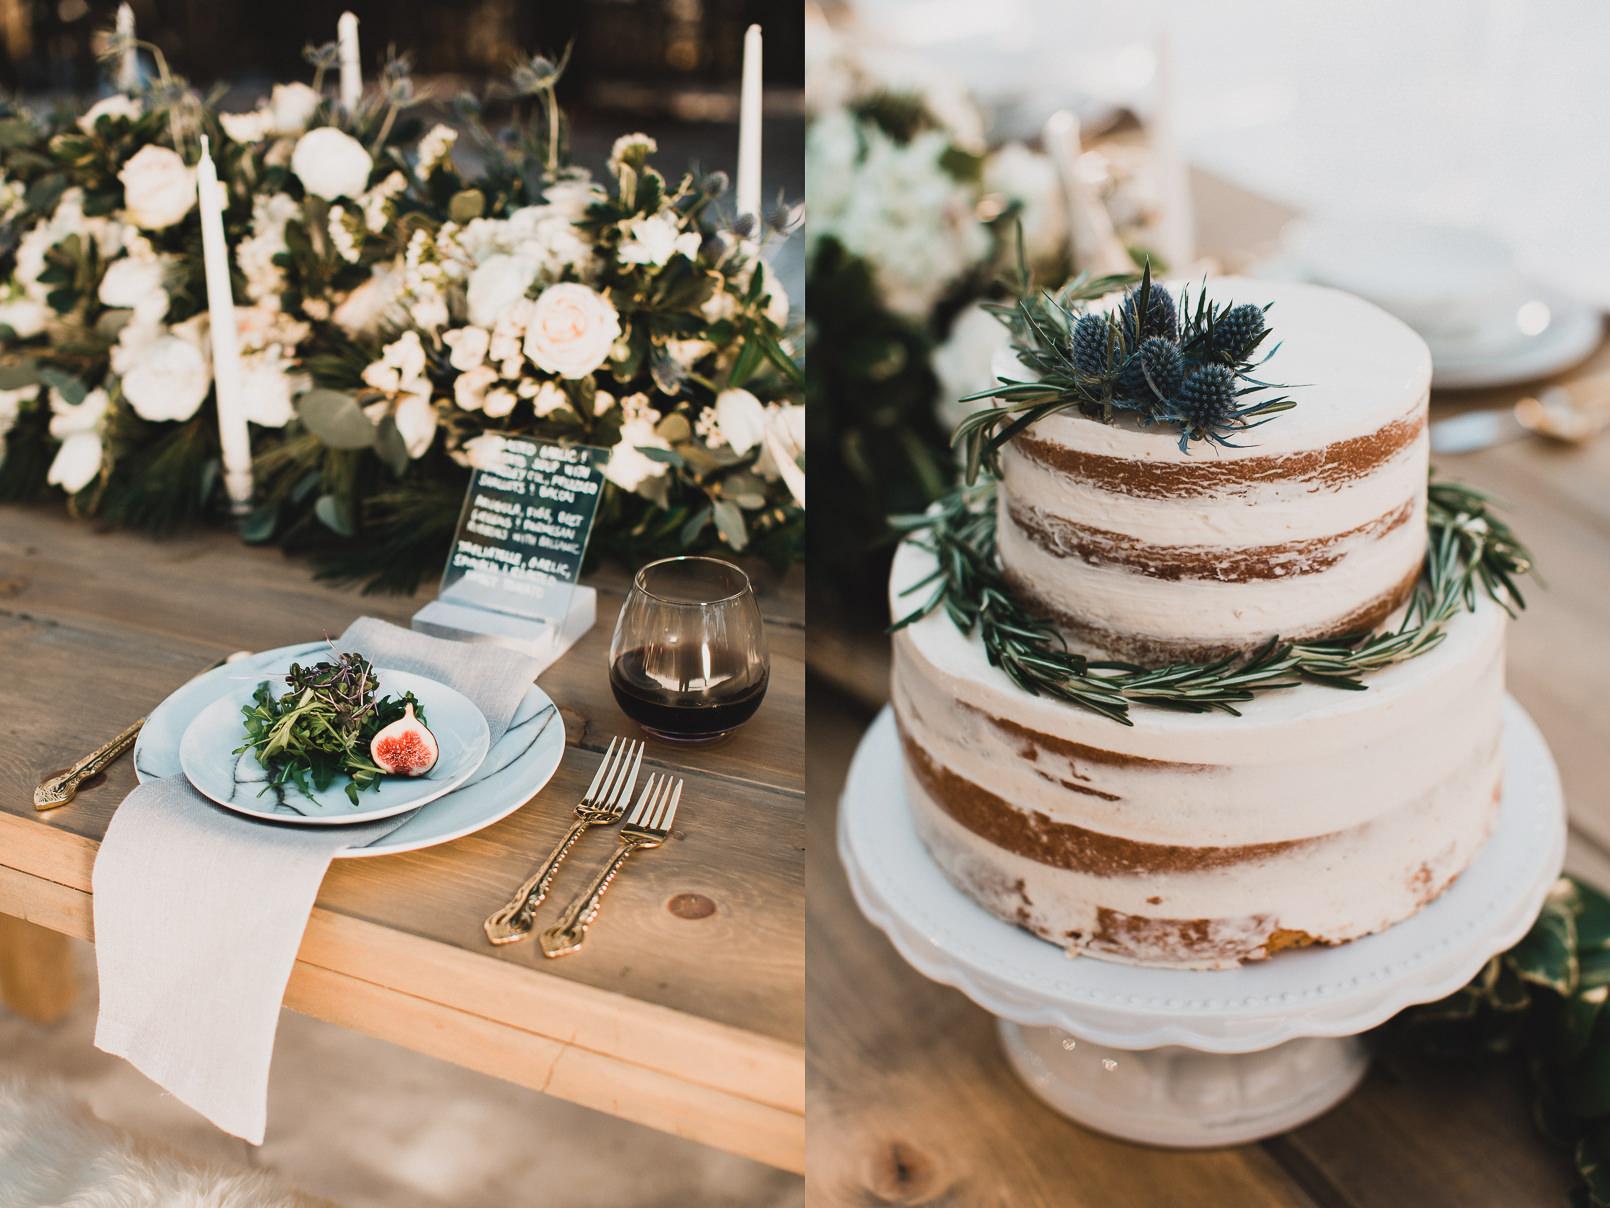 037-Jonathan-Kuhn-Photography-Wedding-_mini.jpg